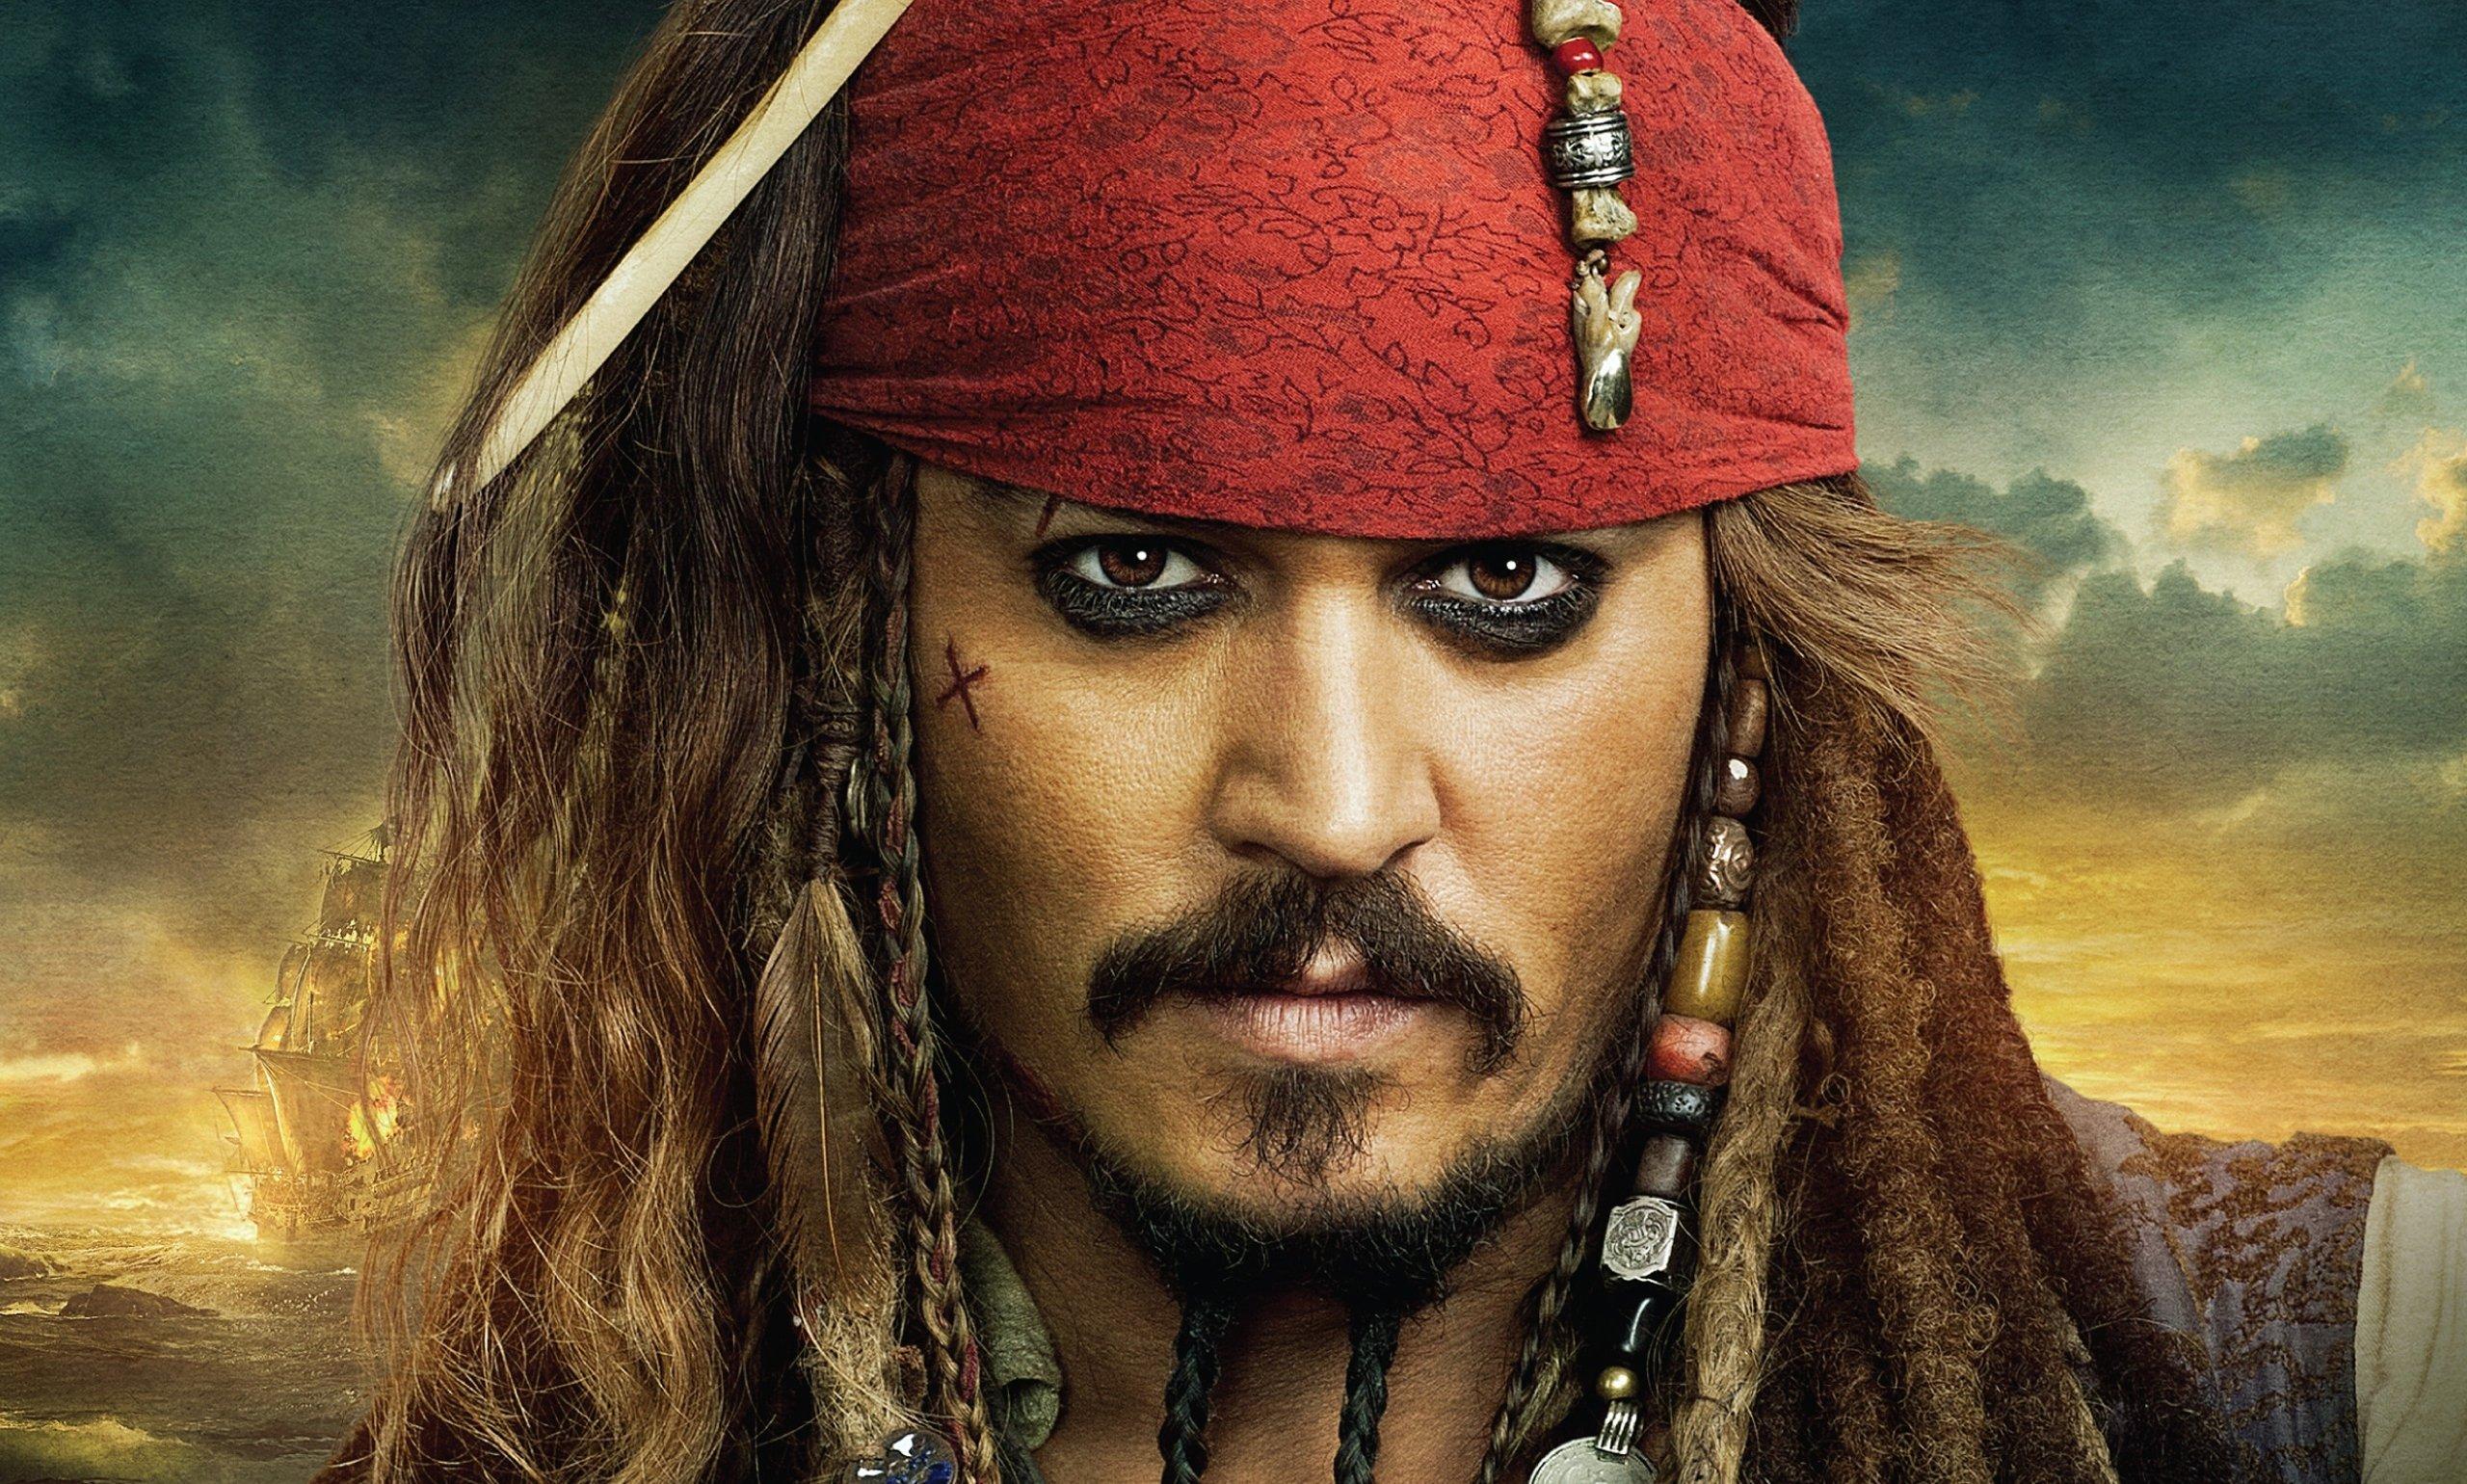 Which Disney Movie Have Hackers Targeted? - Kuulpeeps